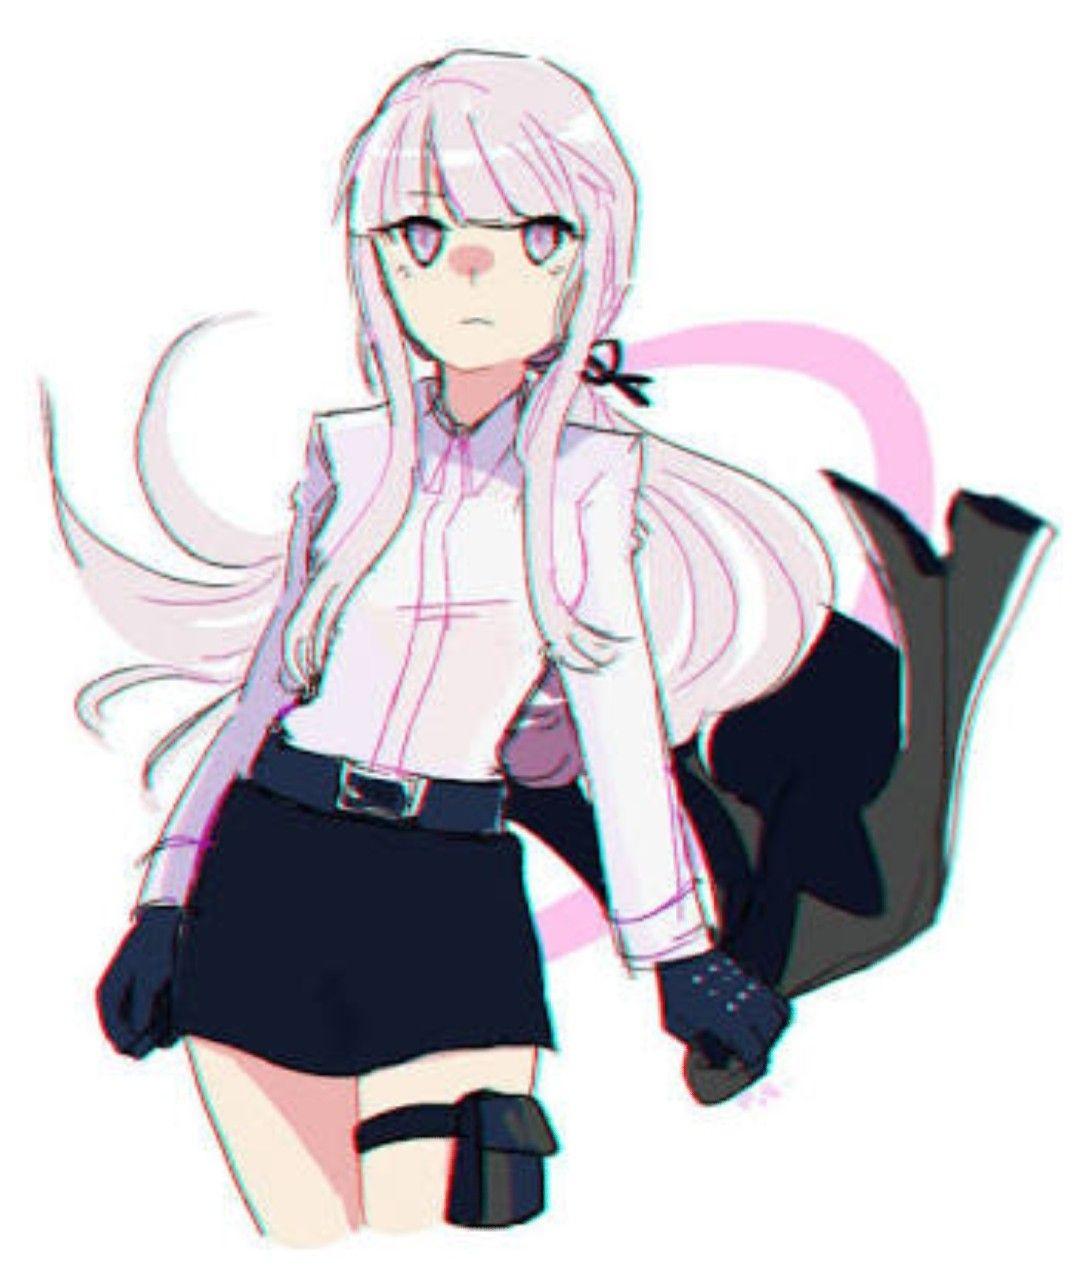 Kirigiri danganronpa characters danganronpa anime